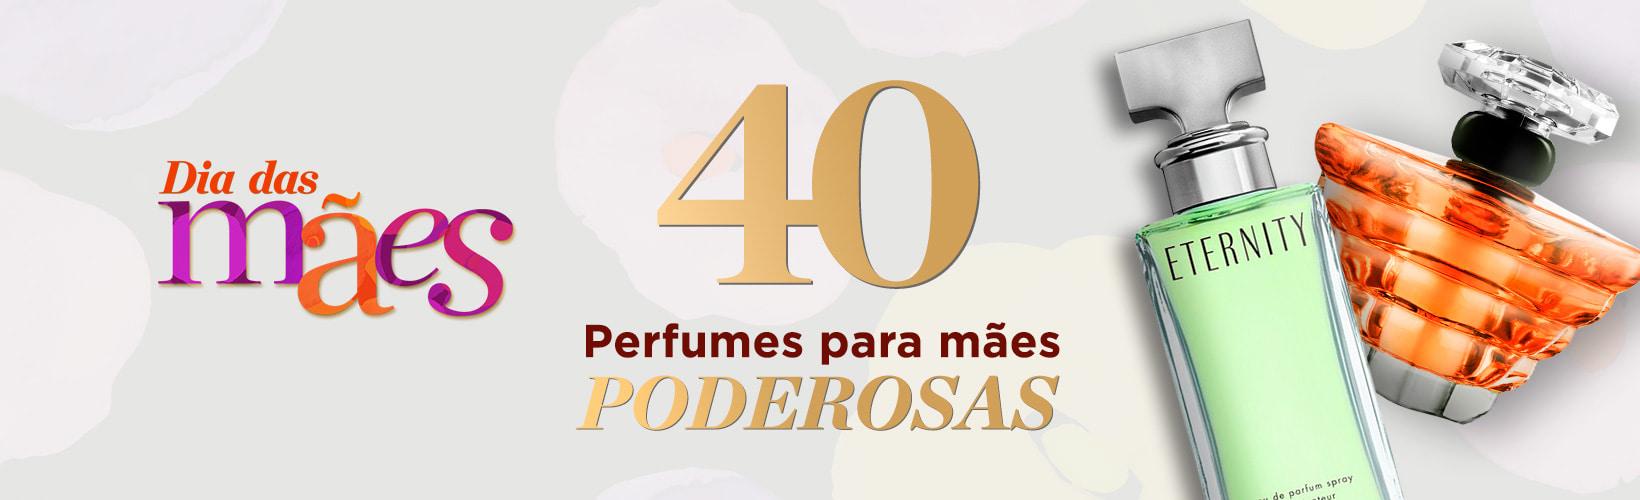 Dia das Mães Perfumes para Presente